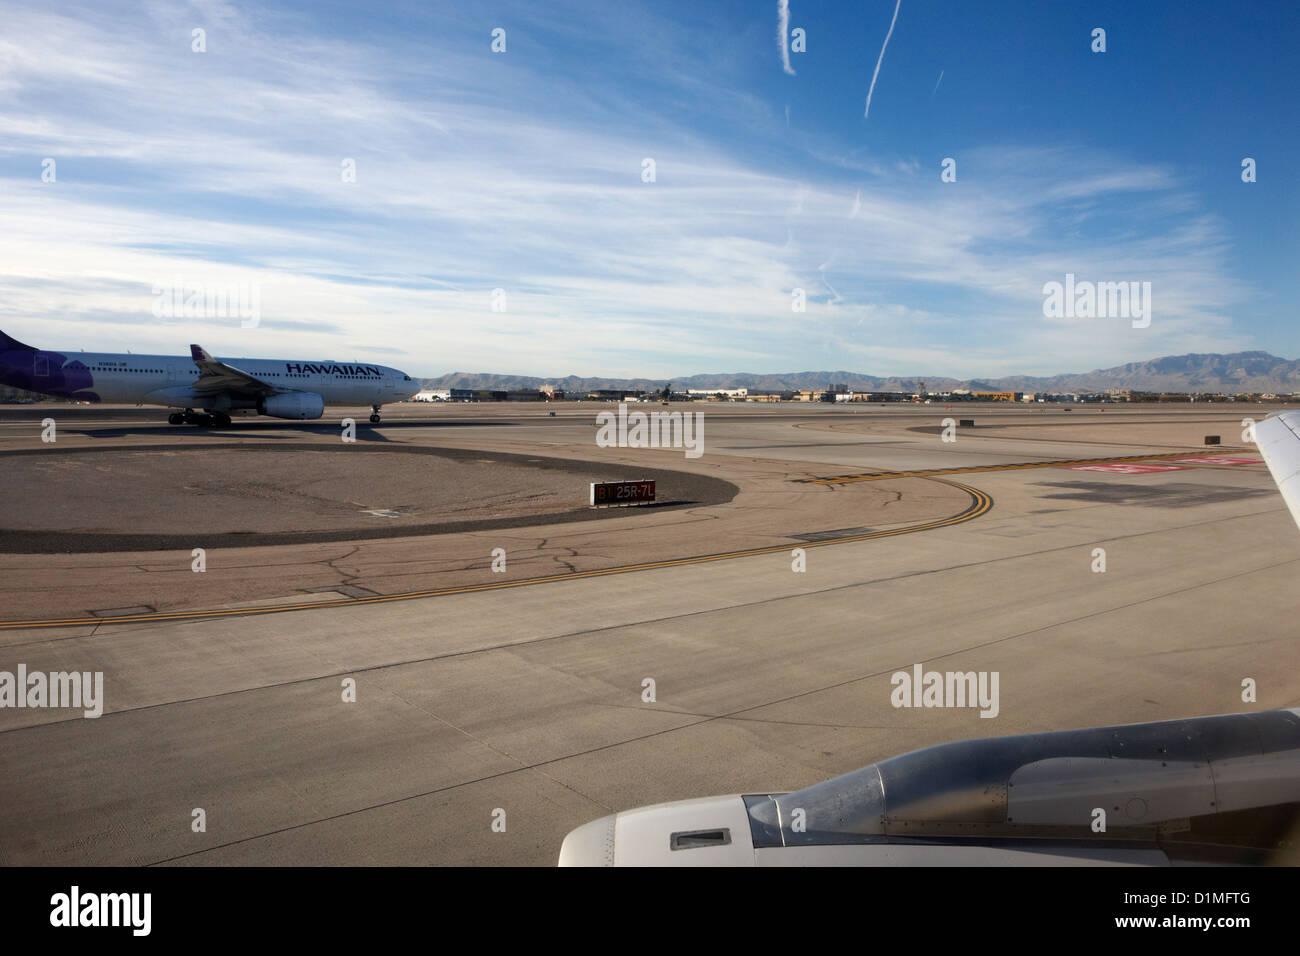 aircraft on runway and taxiway waiting to take off at McCarran International airport Las Vegas Nevada USA - Stock Image